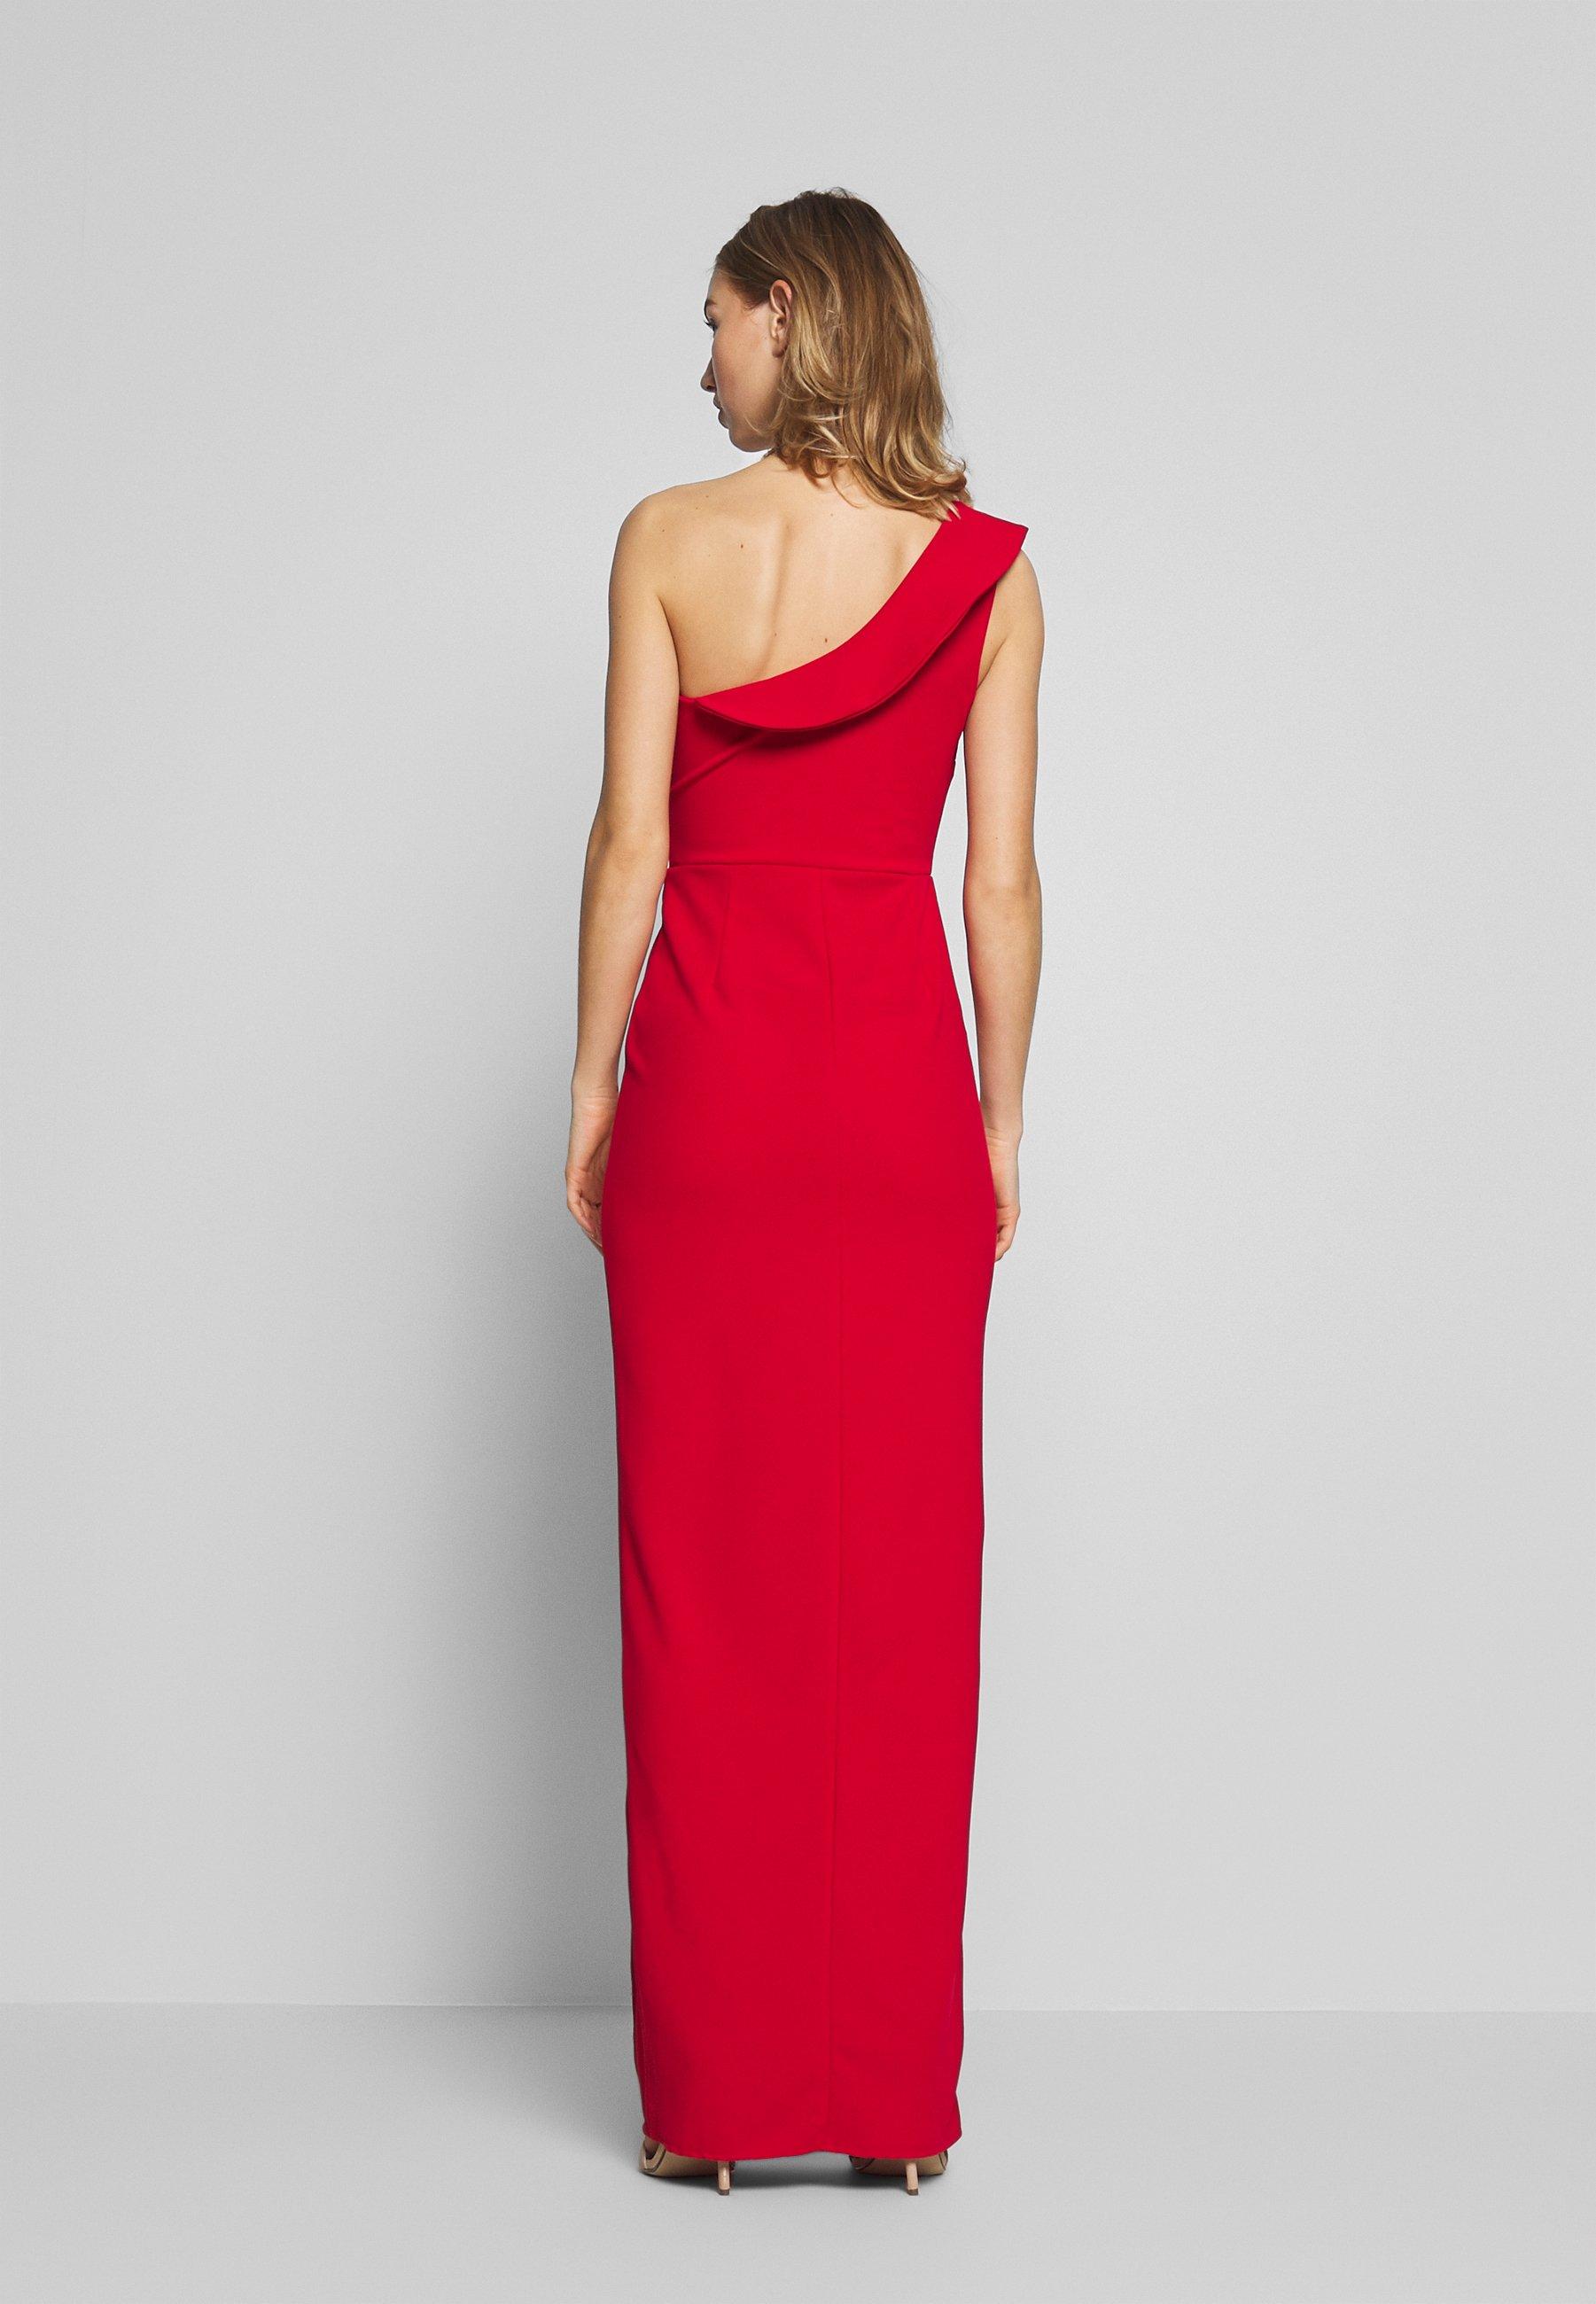 Wal G. Off The Shoulder Frill Detail Maxi Dress - Festklänning Red